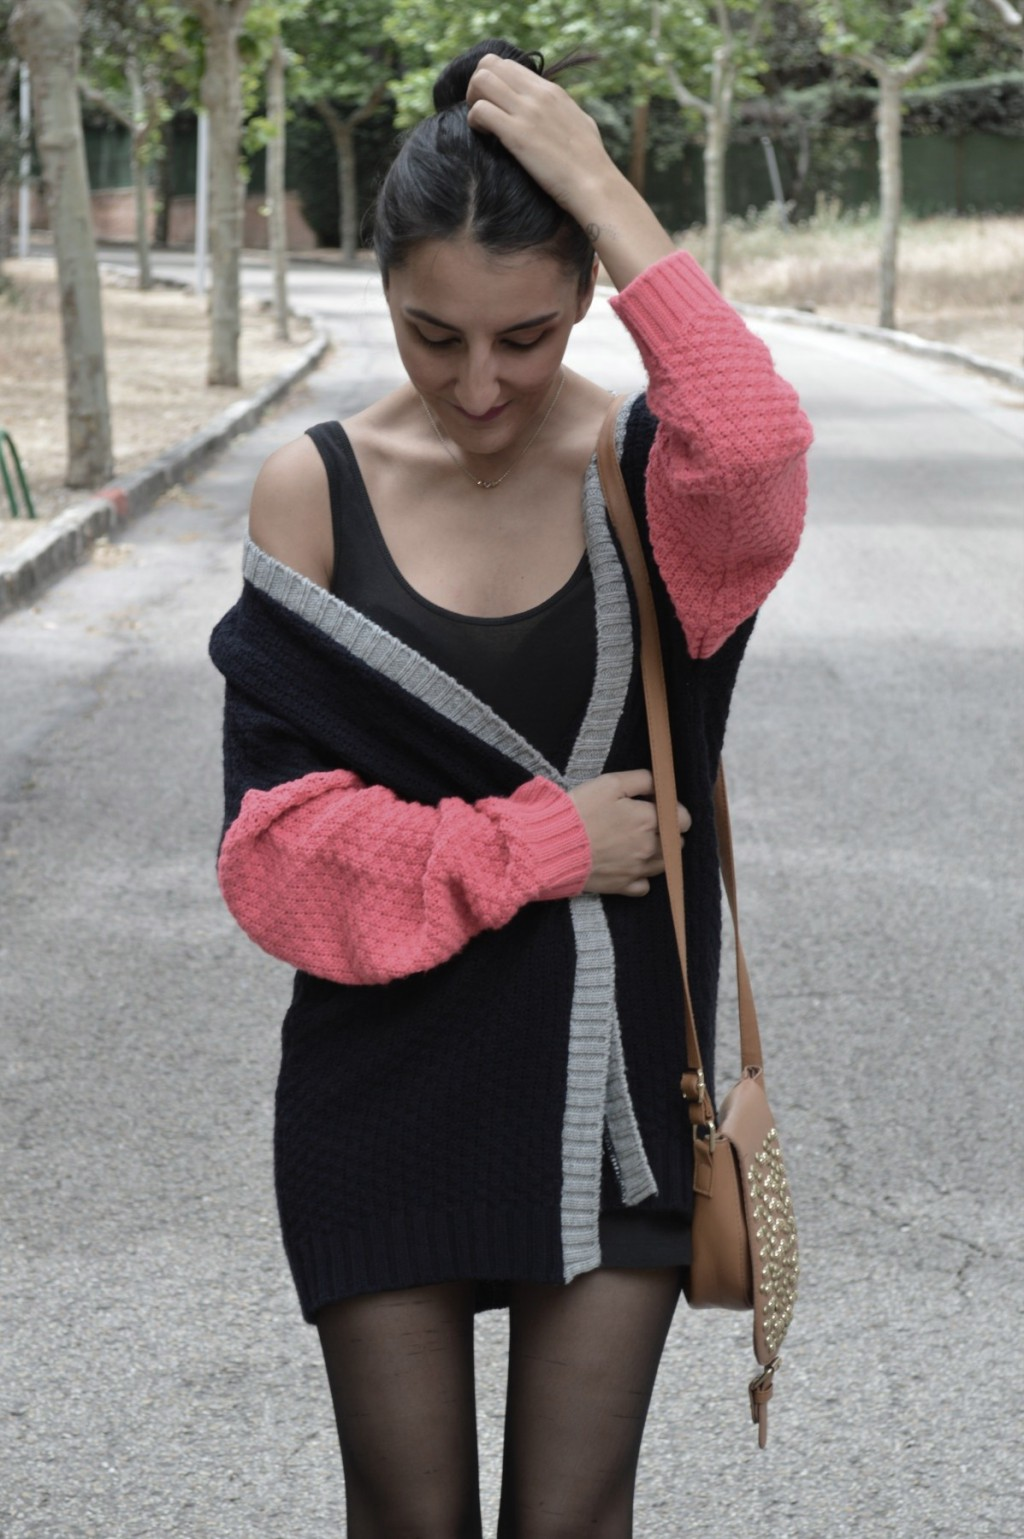 Cardigan: Primark (old) Vestido / dress: H&M (old) Botas de agua / gumboots: Pepita Perez Bolso / bag: Primark